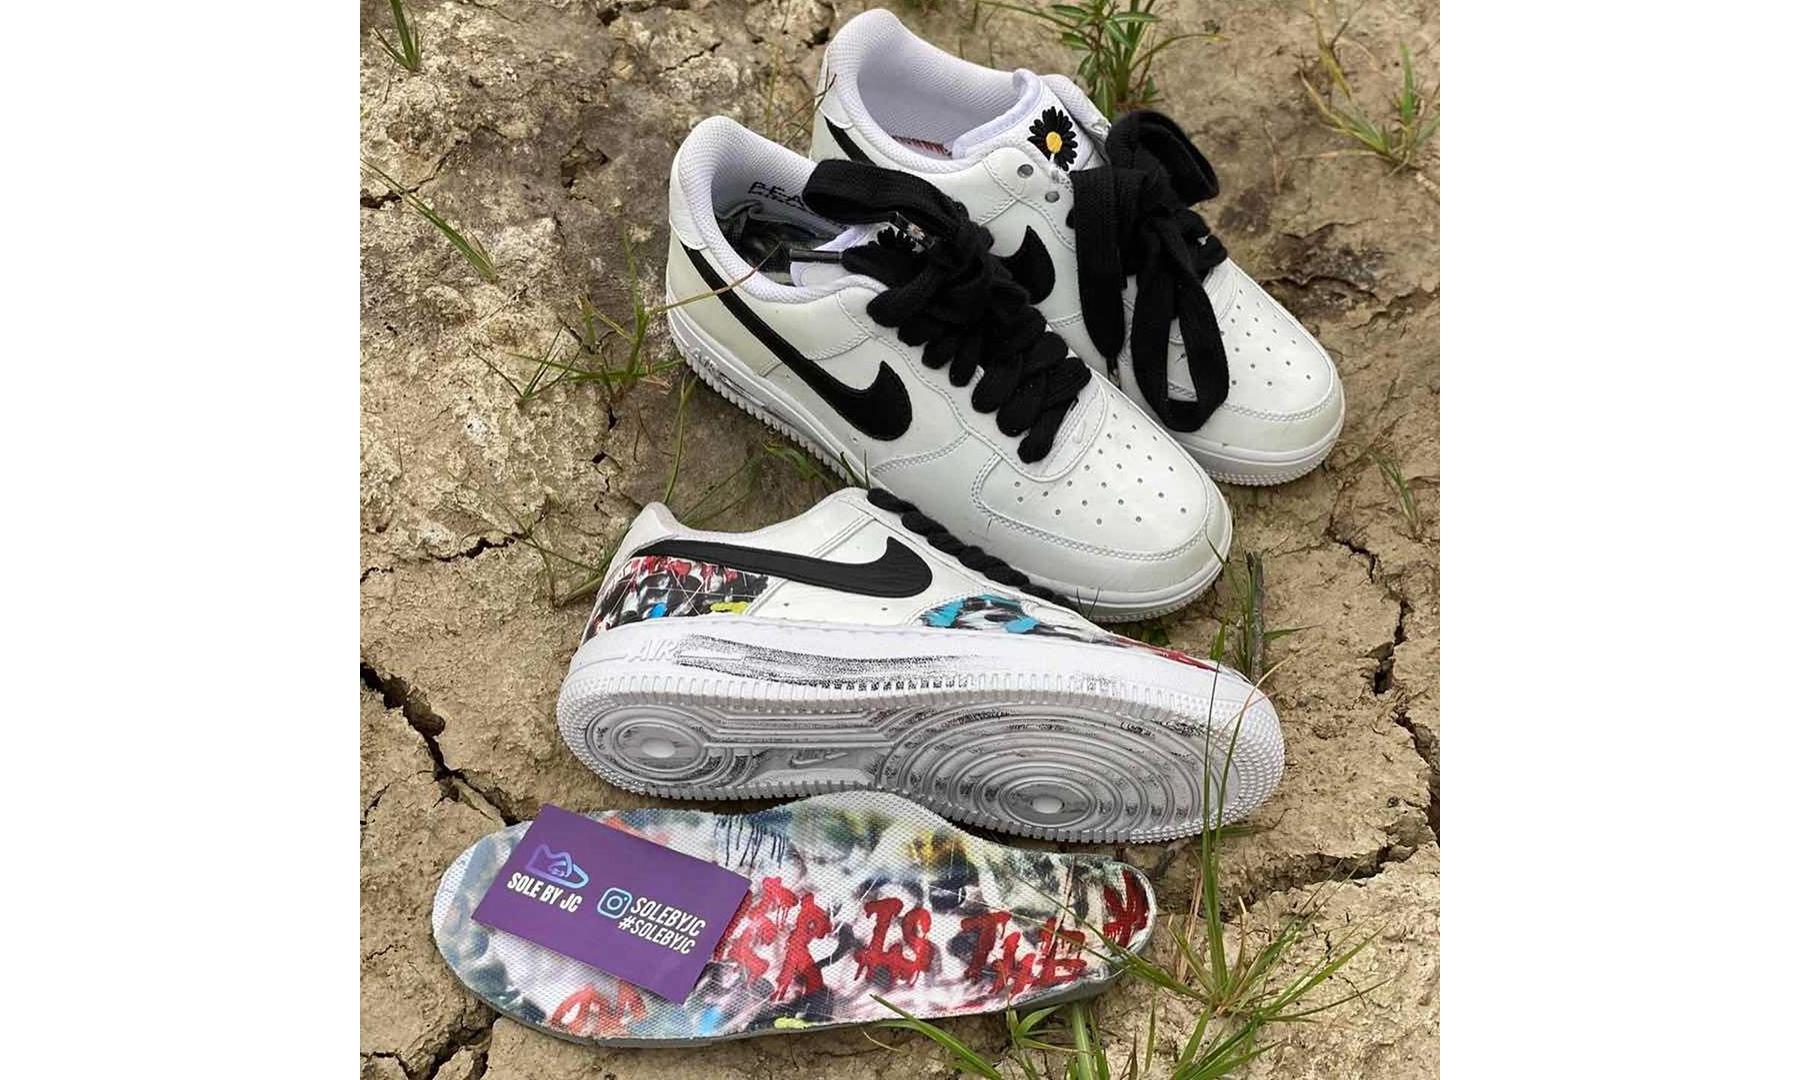 PEACEMINUSONE x Nike Air Force 1 最新实物近赏出炉